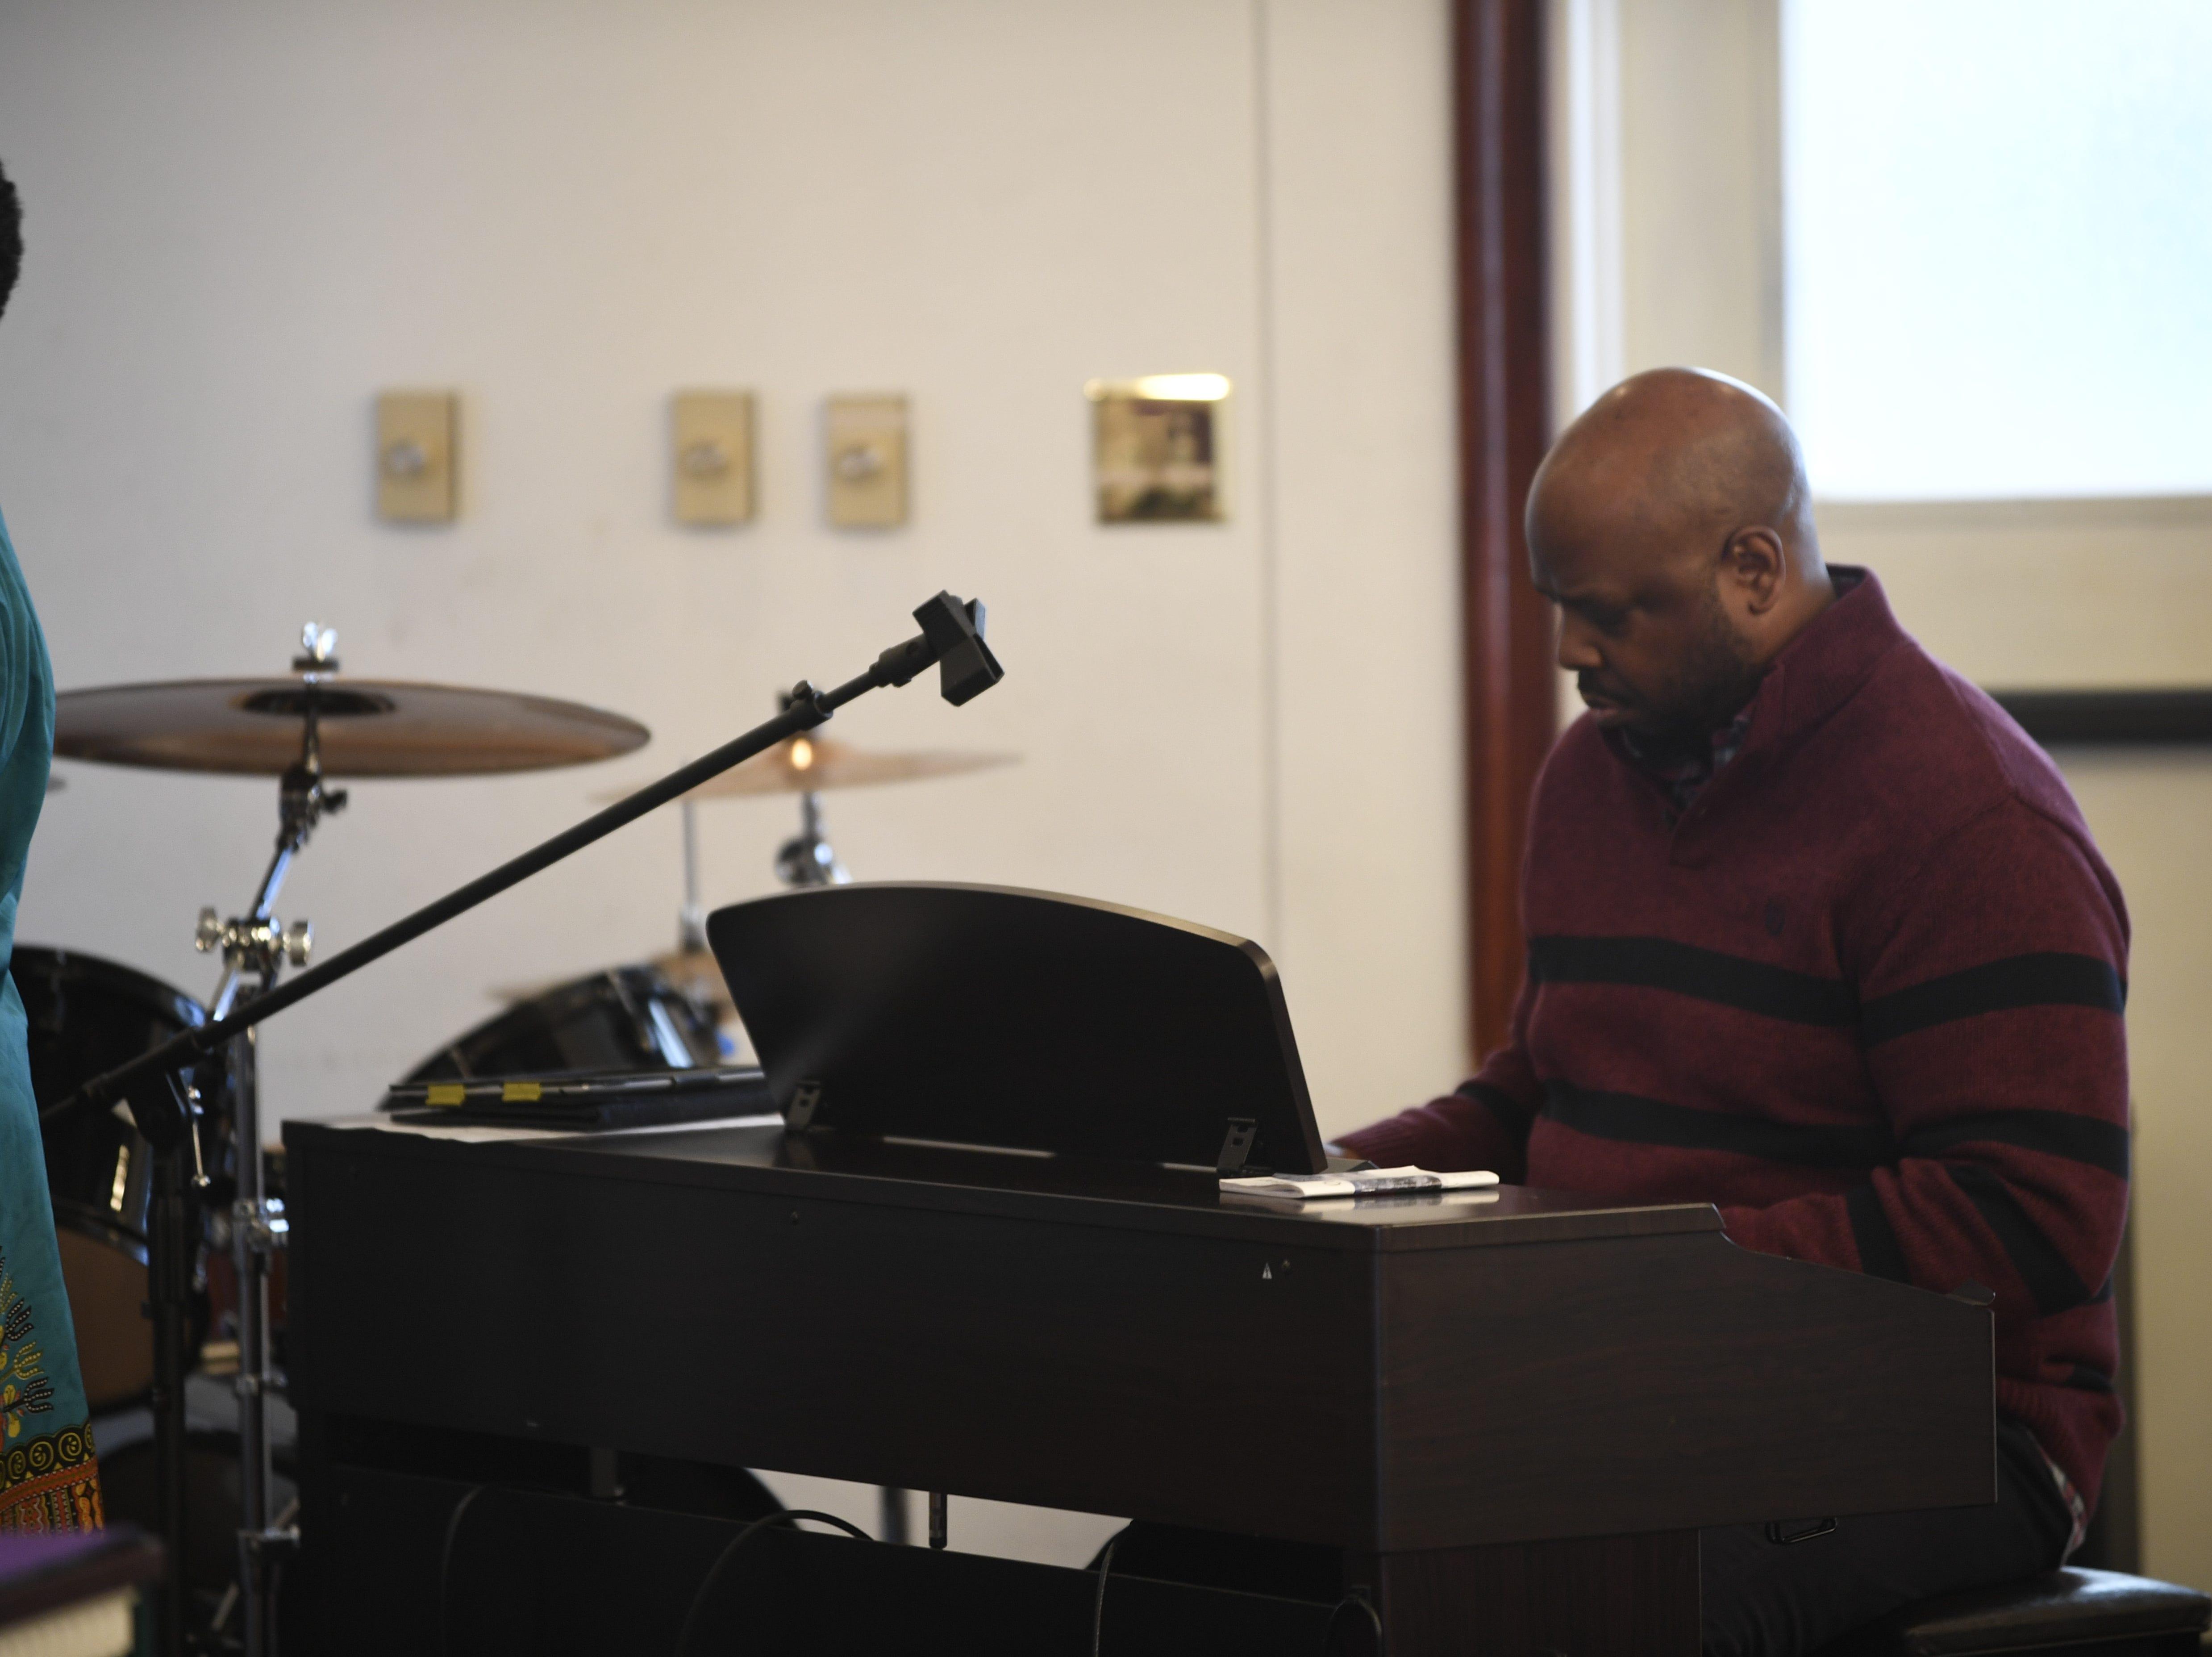 Steve Adams plays the piano during Mt. Pleasant Church's Black History Month event, in Pinson, Tenn. Feb 24, 2019.